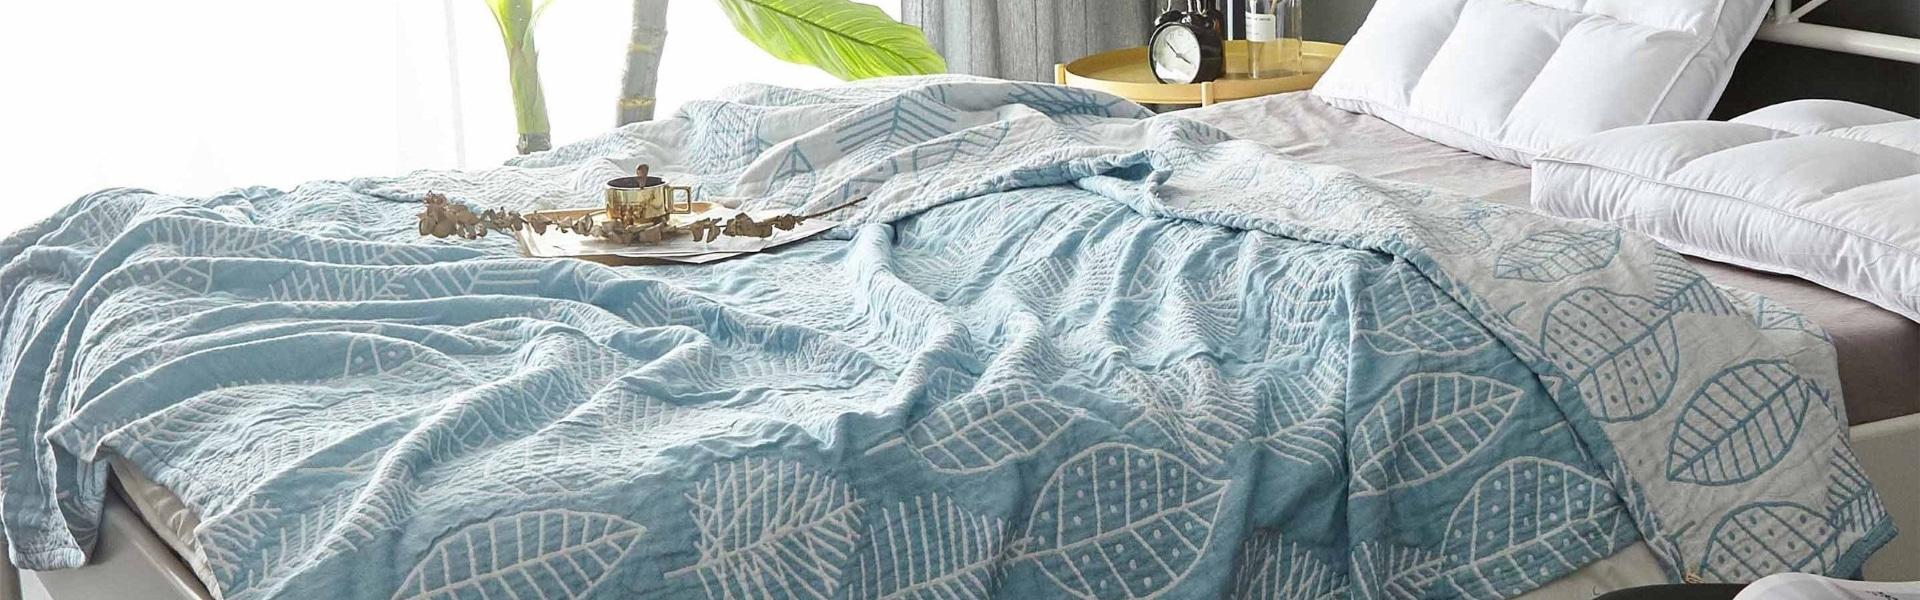 Best Summer Blankets Reviewed in Detail